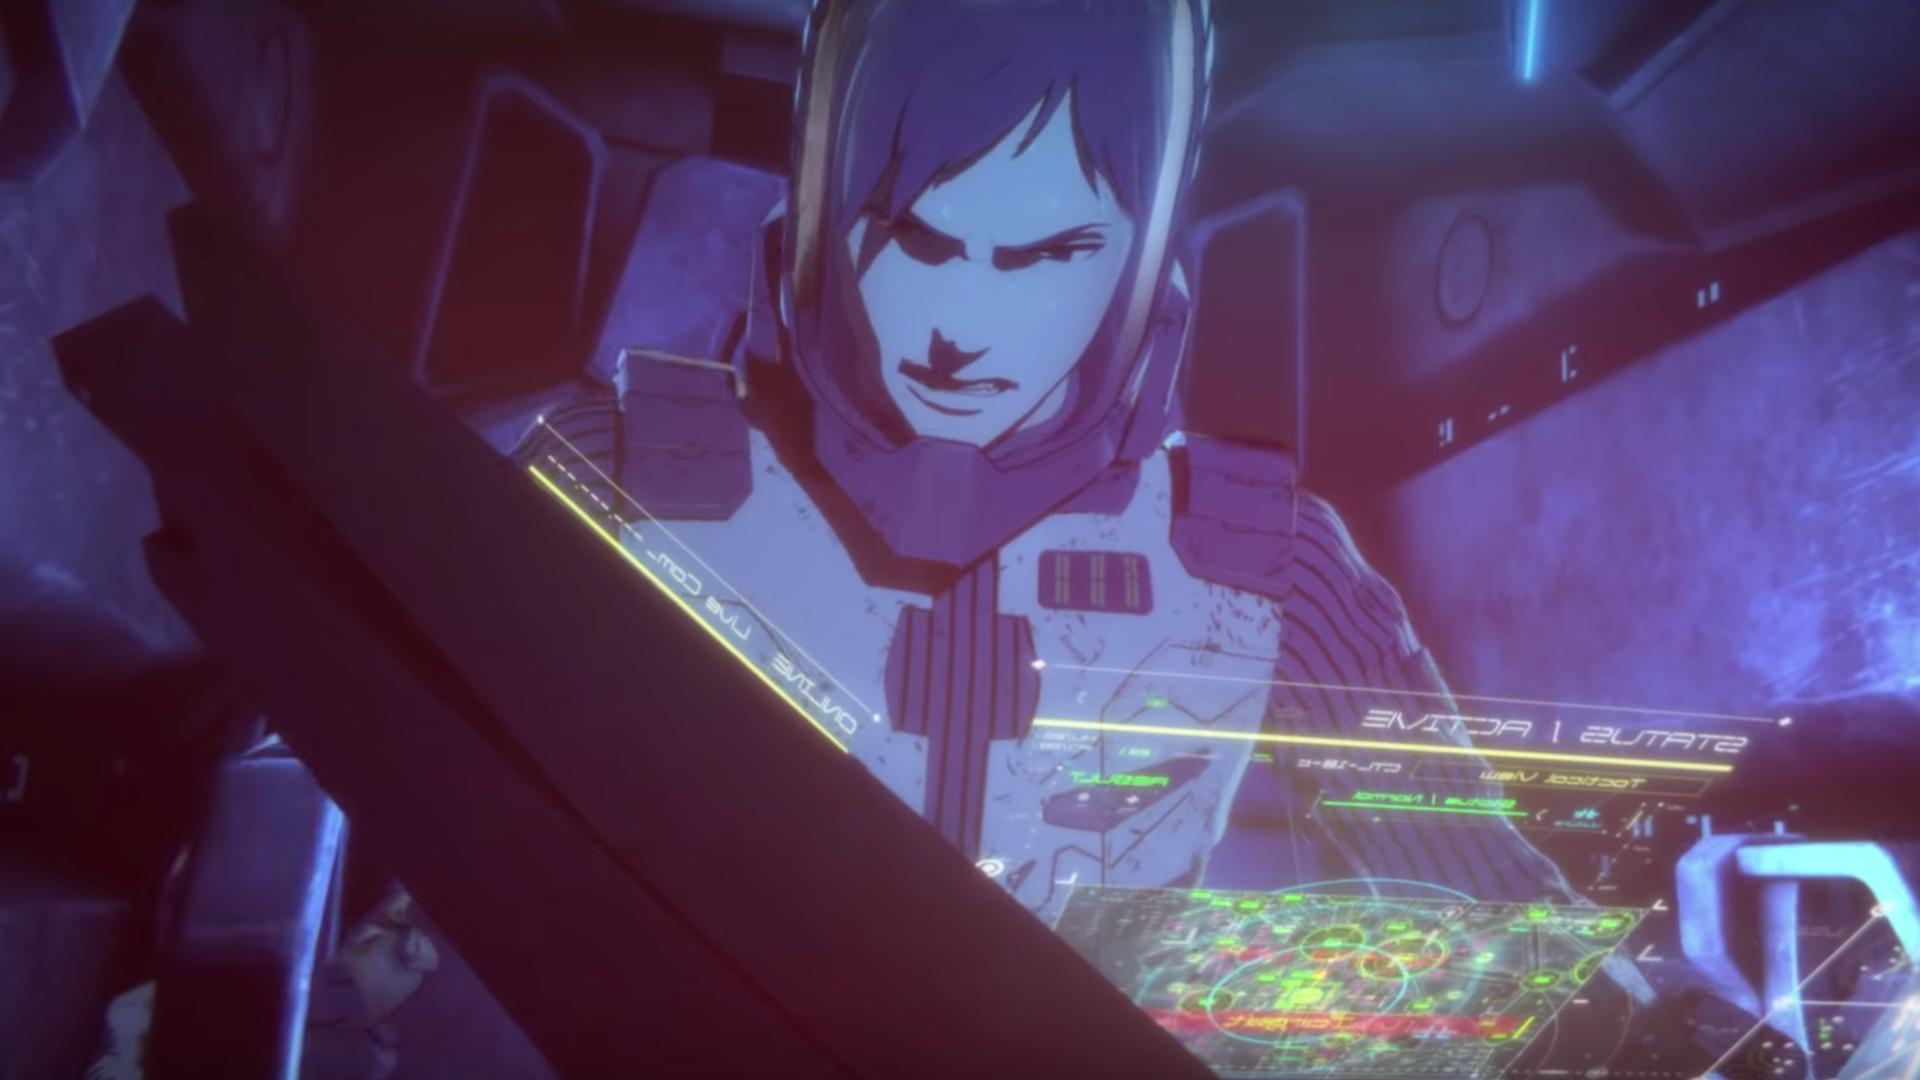 cool-new-trailer-for-tohos-godzilla-city-on-the-edge-of-battle-anime-film-social.jpg